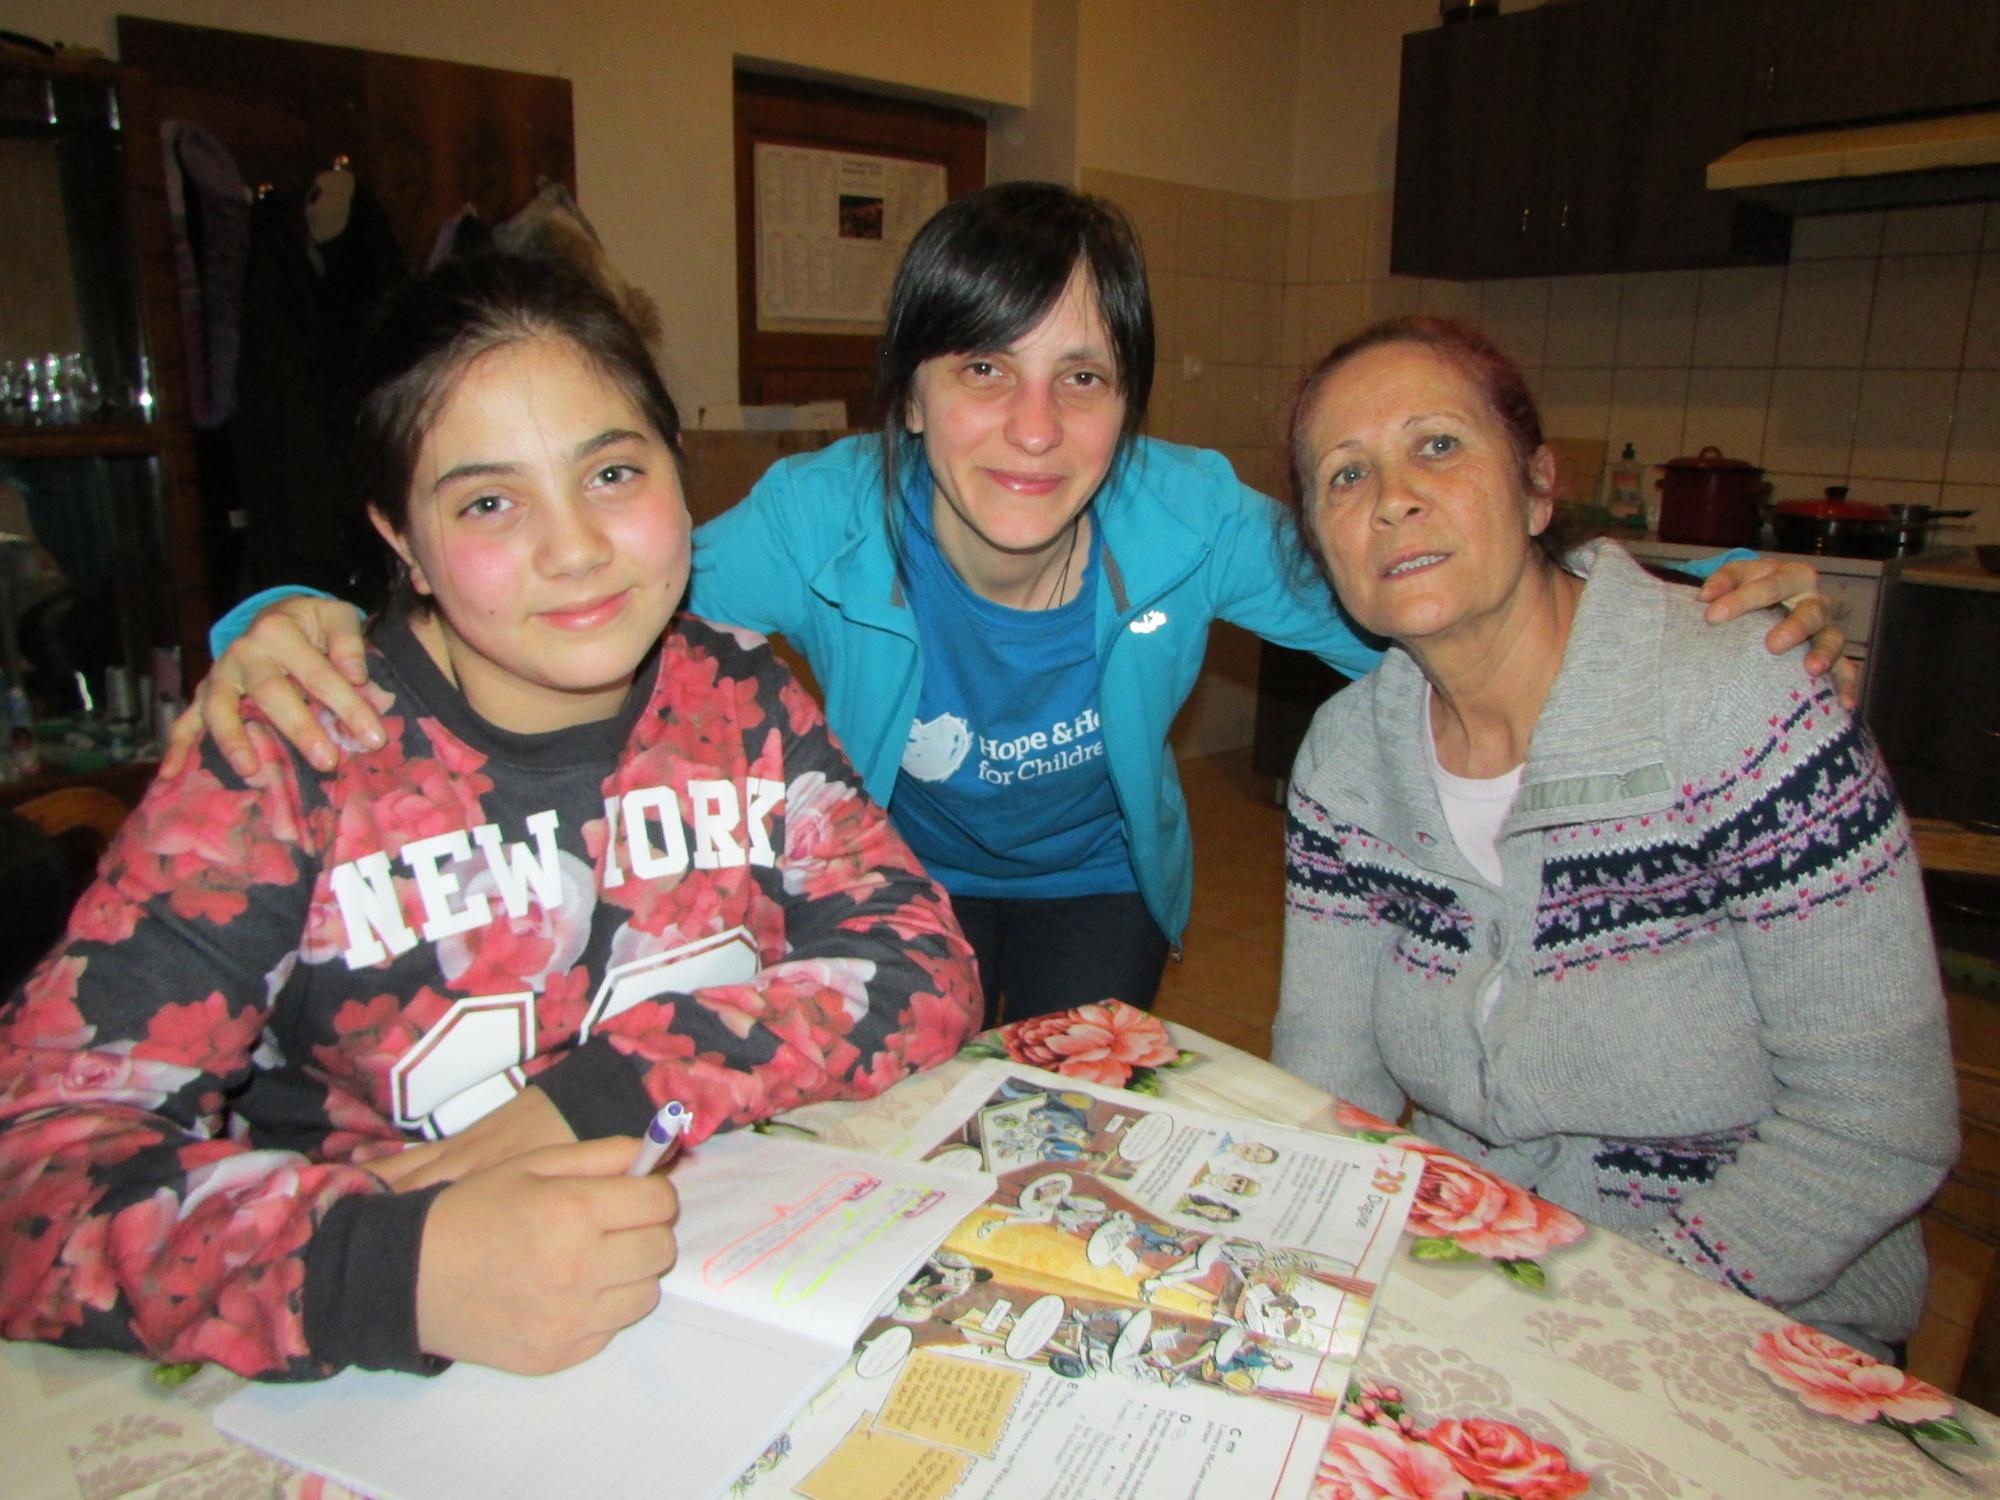 Sonia_Paula+Georgescu_Florina+CRetar.jpeg